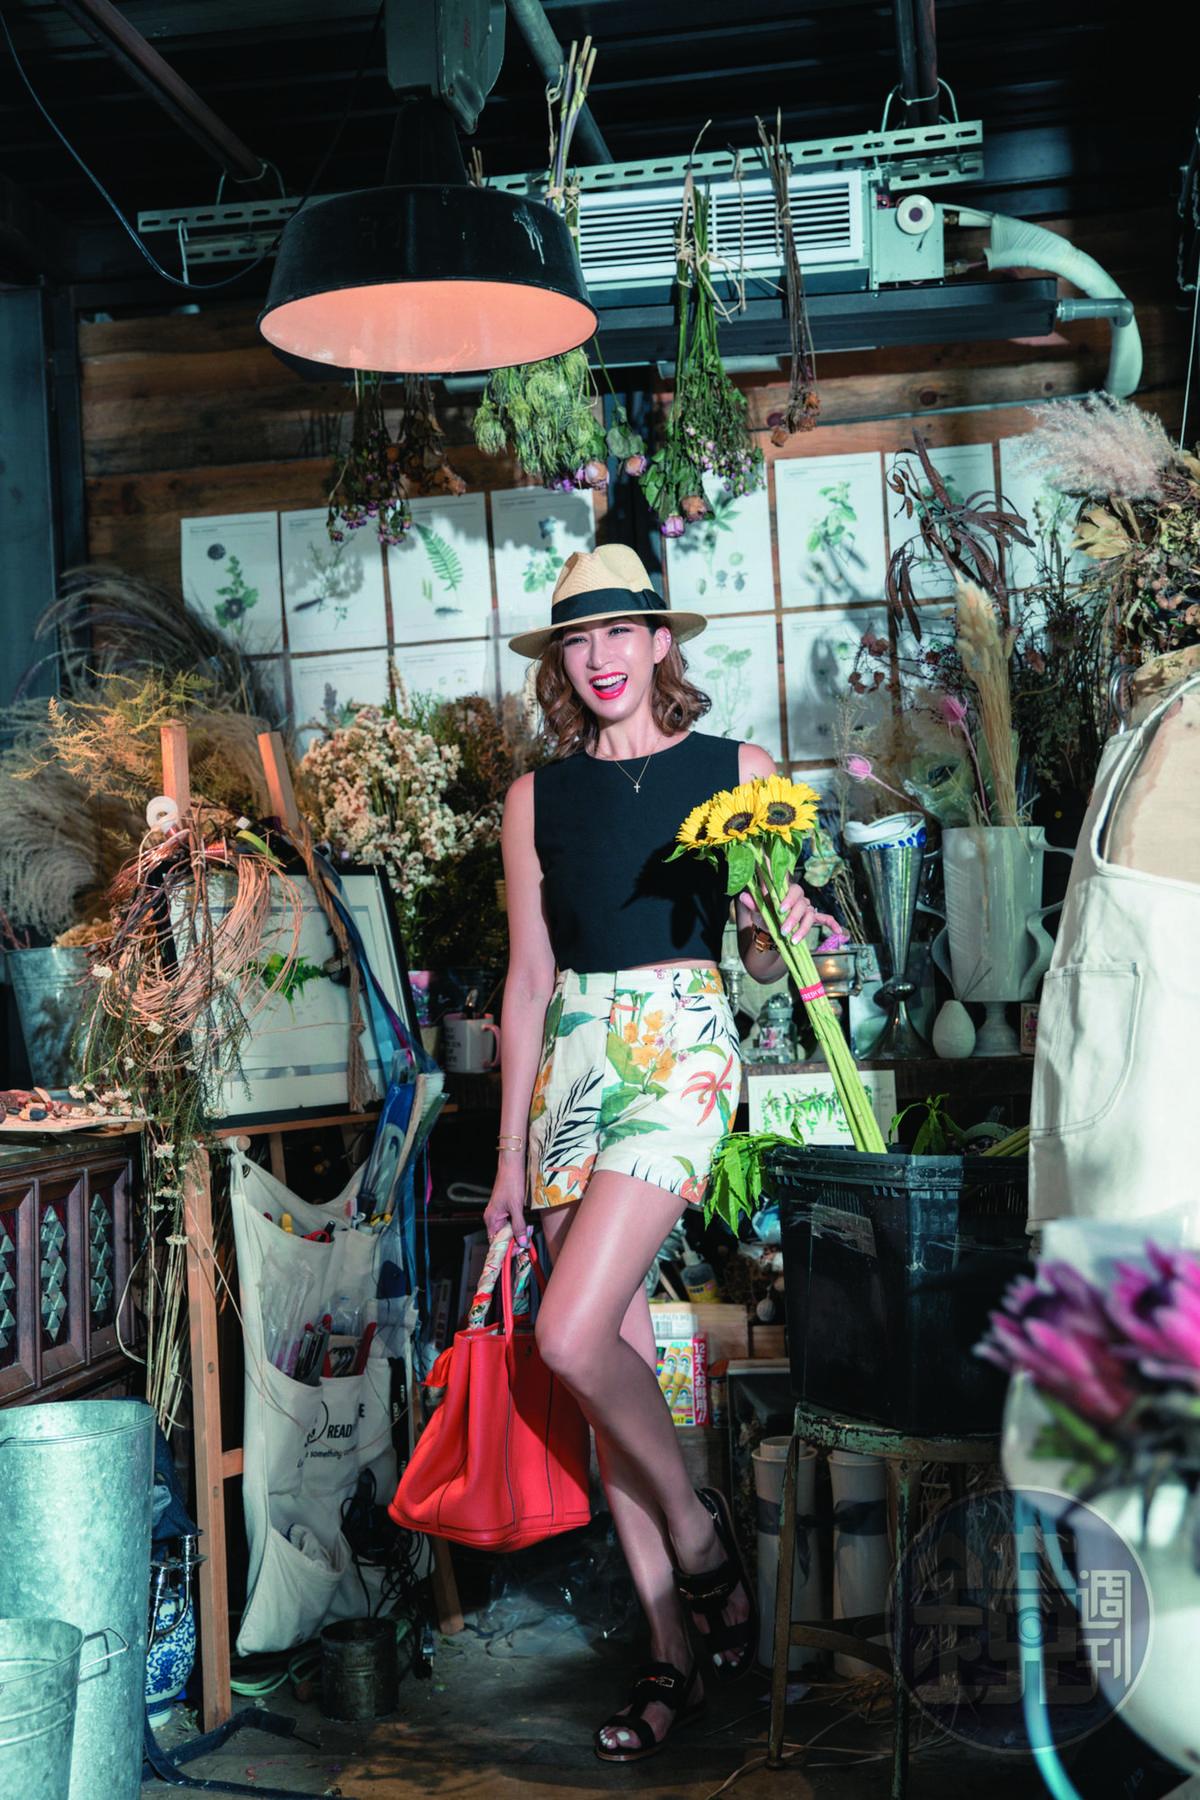 ZARA黑色背心,約NT$1,000;ZARA花卉圖騰短褲,約NT$1,300;TOD'S涼鞋,約NT$18,000;MILANI草帽,約NT$3,000;HERMÈS Garden Party橘色包,老公贈送;單顆圓鑽項鍊,是7位姐妹淘1人1條的項鍊,約NT$20,000;ARTIFACTS手飾組,朋友贈送。